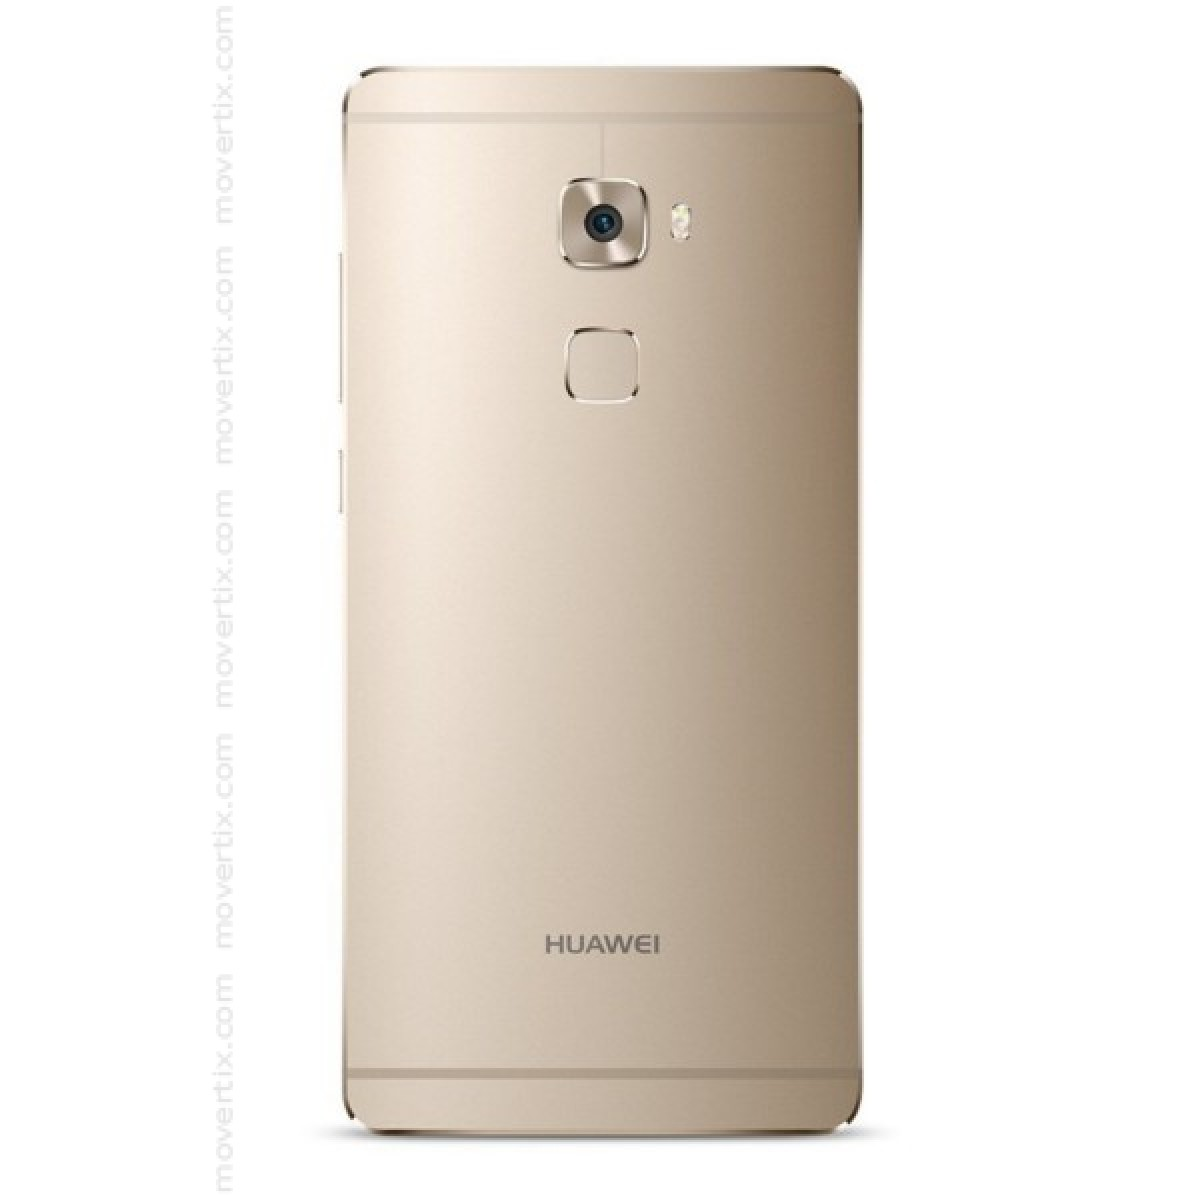 Huawei Mate S Gold 128GB (6901443095827)